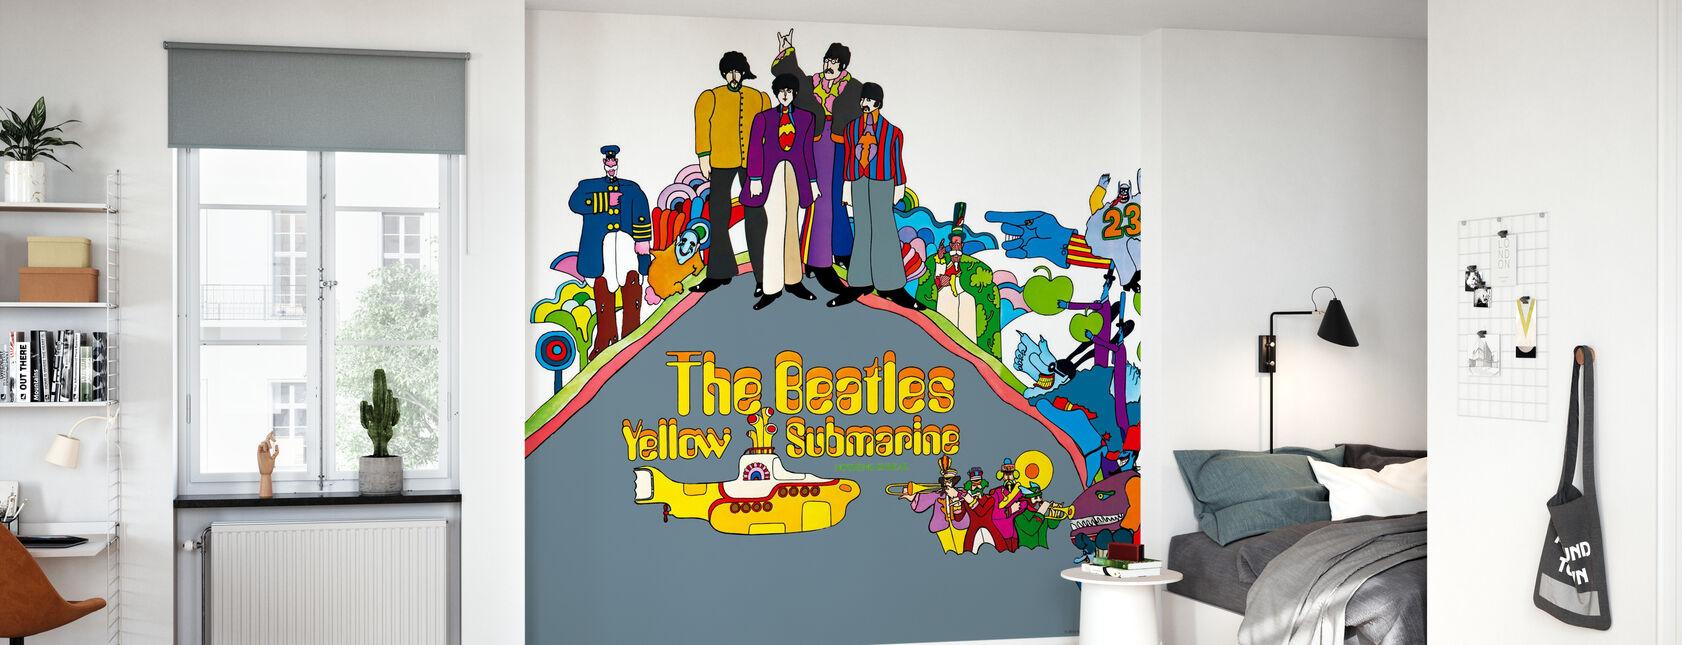 Beatles - Yellow Submarine - Wallpaper - Kids Room